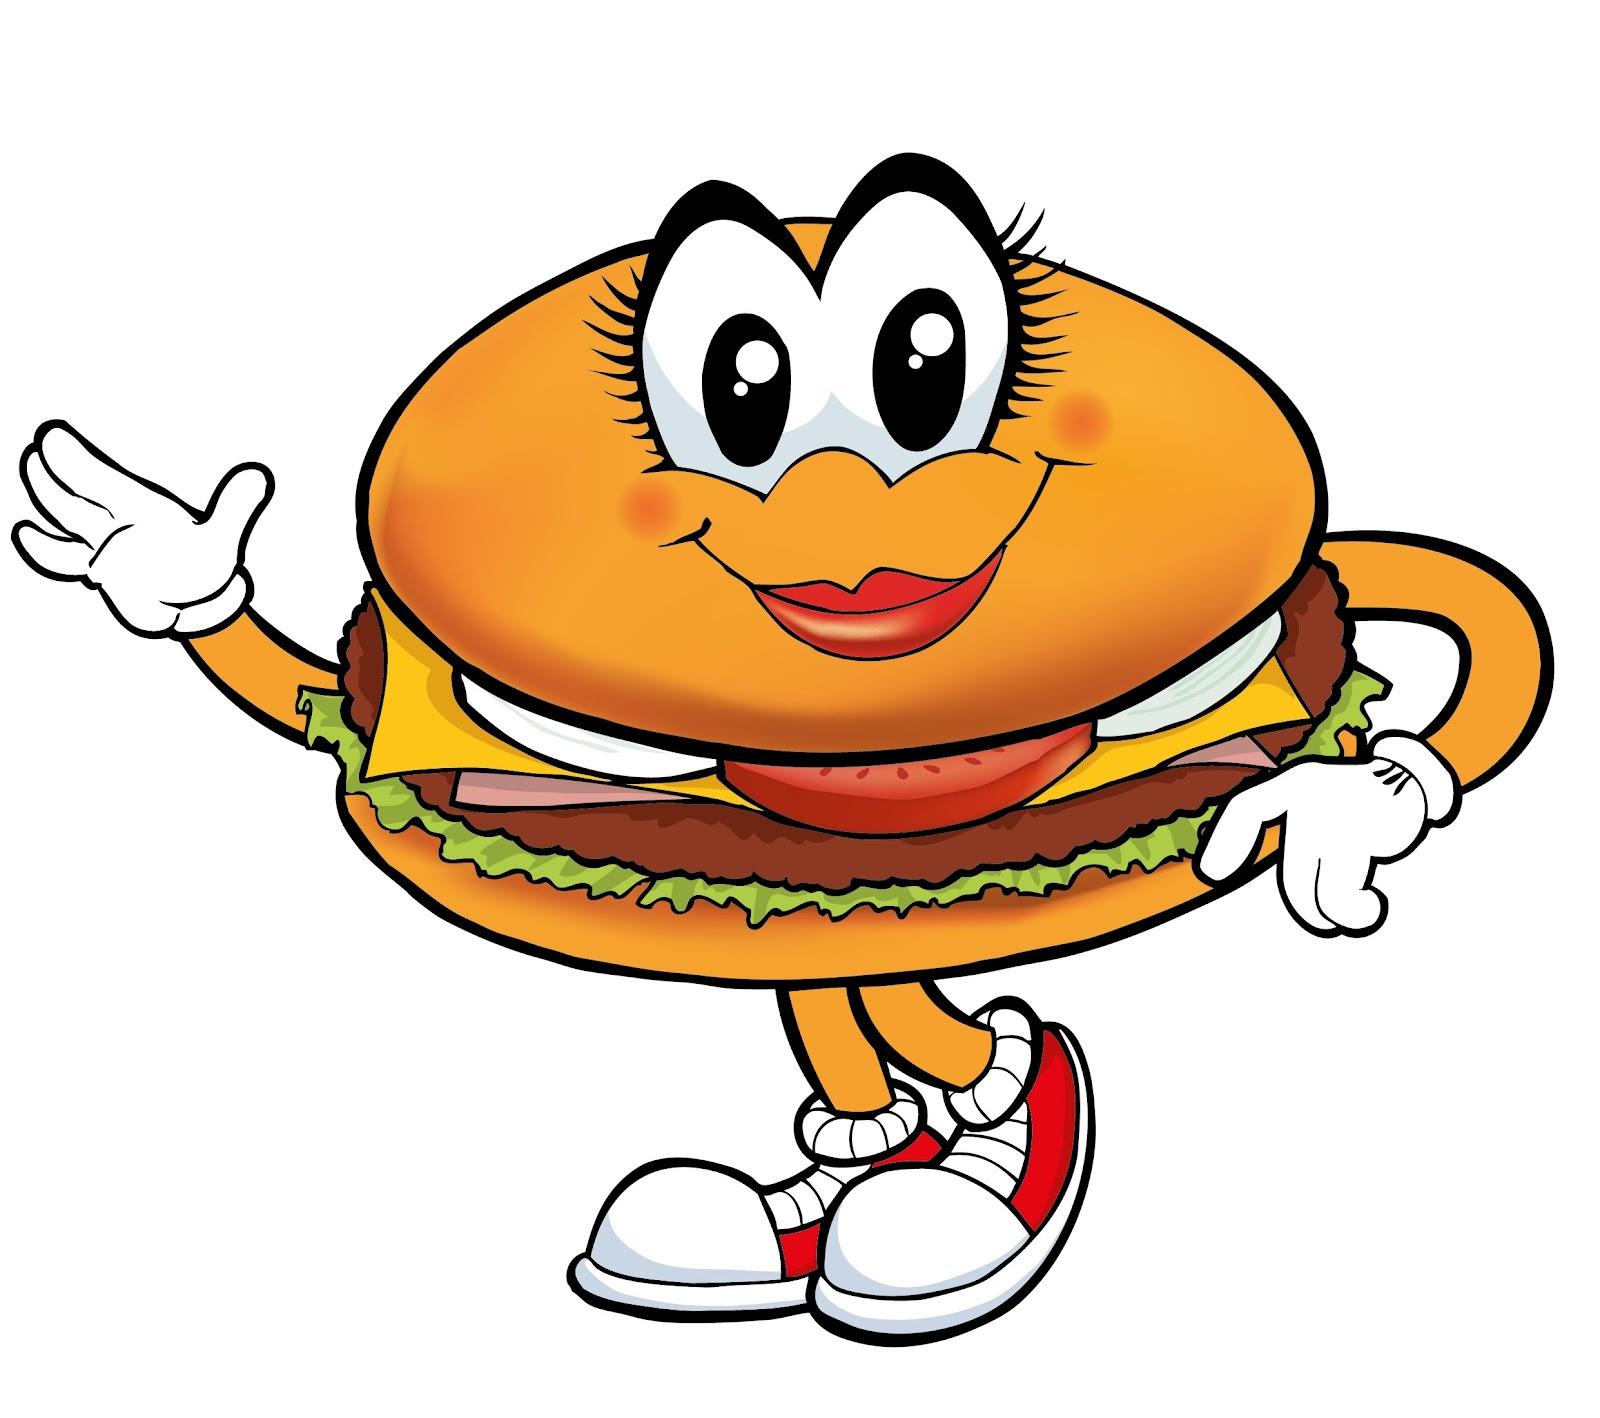 hamburguesa7 Vedetepenet.ro  Porc fragezit in Coca Cola, copt la foc mic   very fashionable